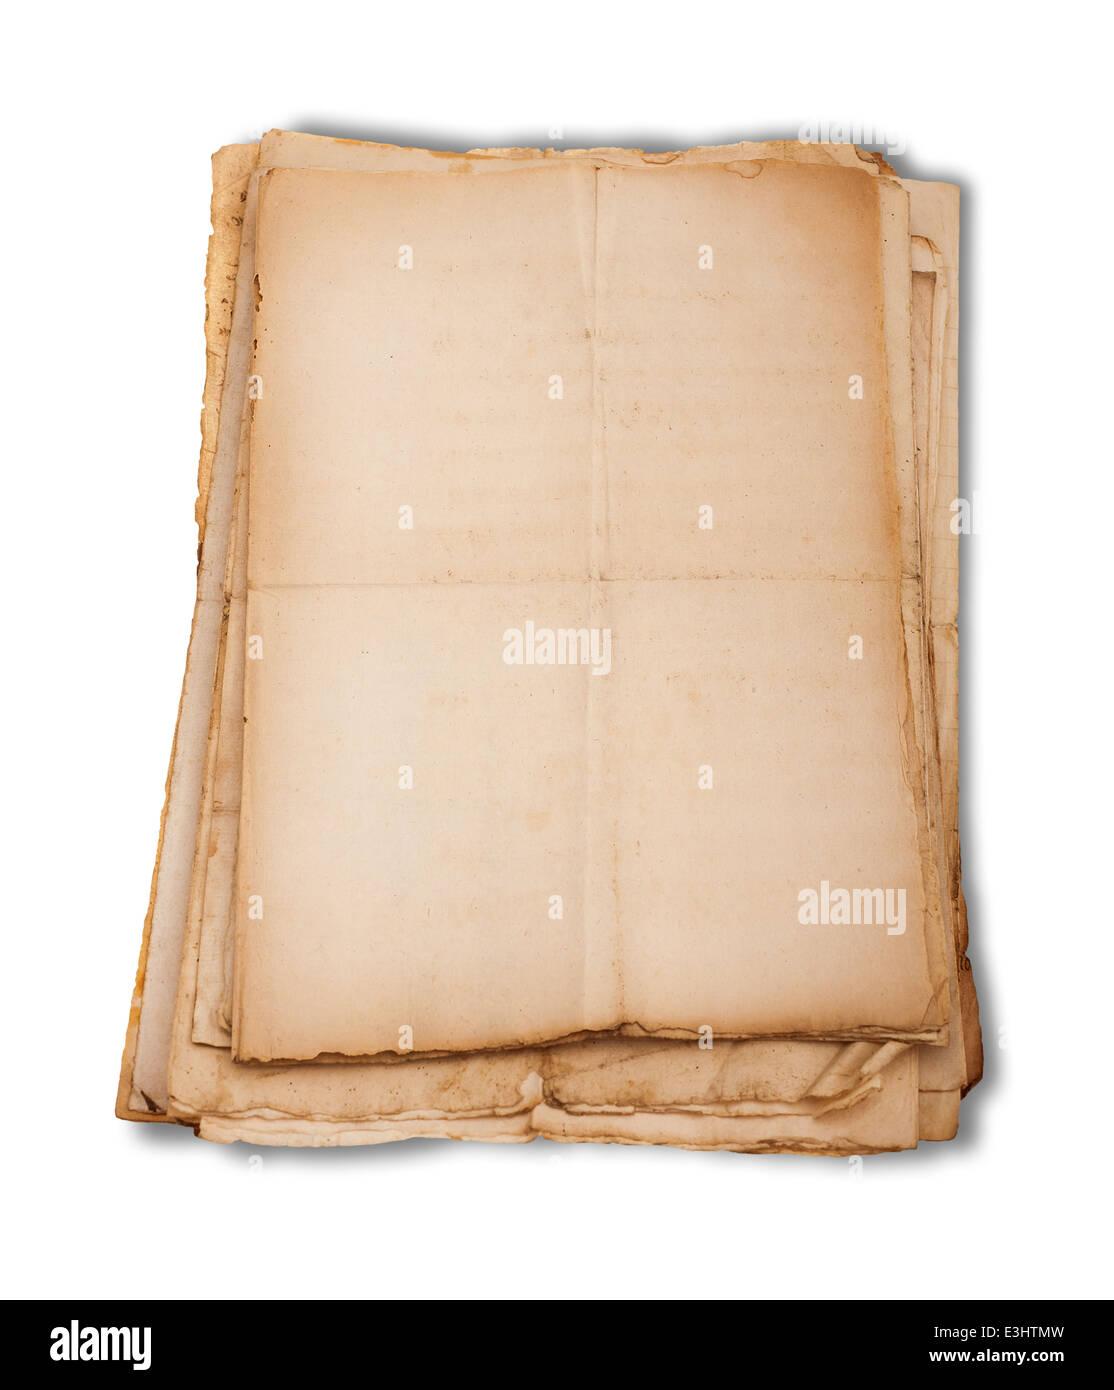 Sheets pile empty isolated on white background - Stock Image